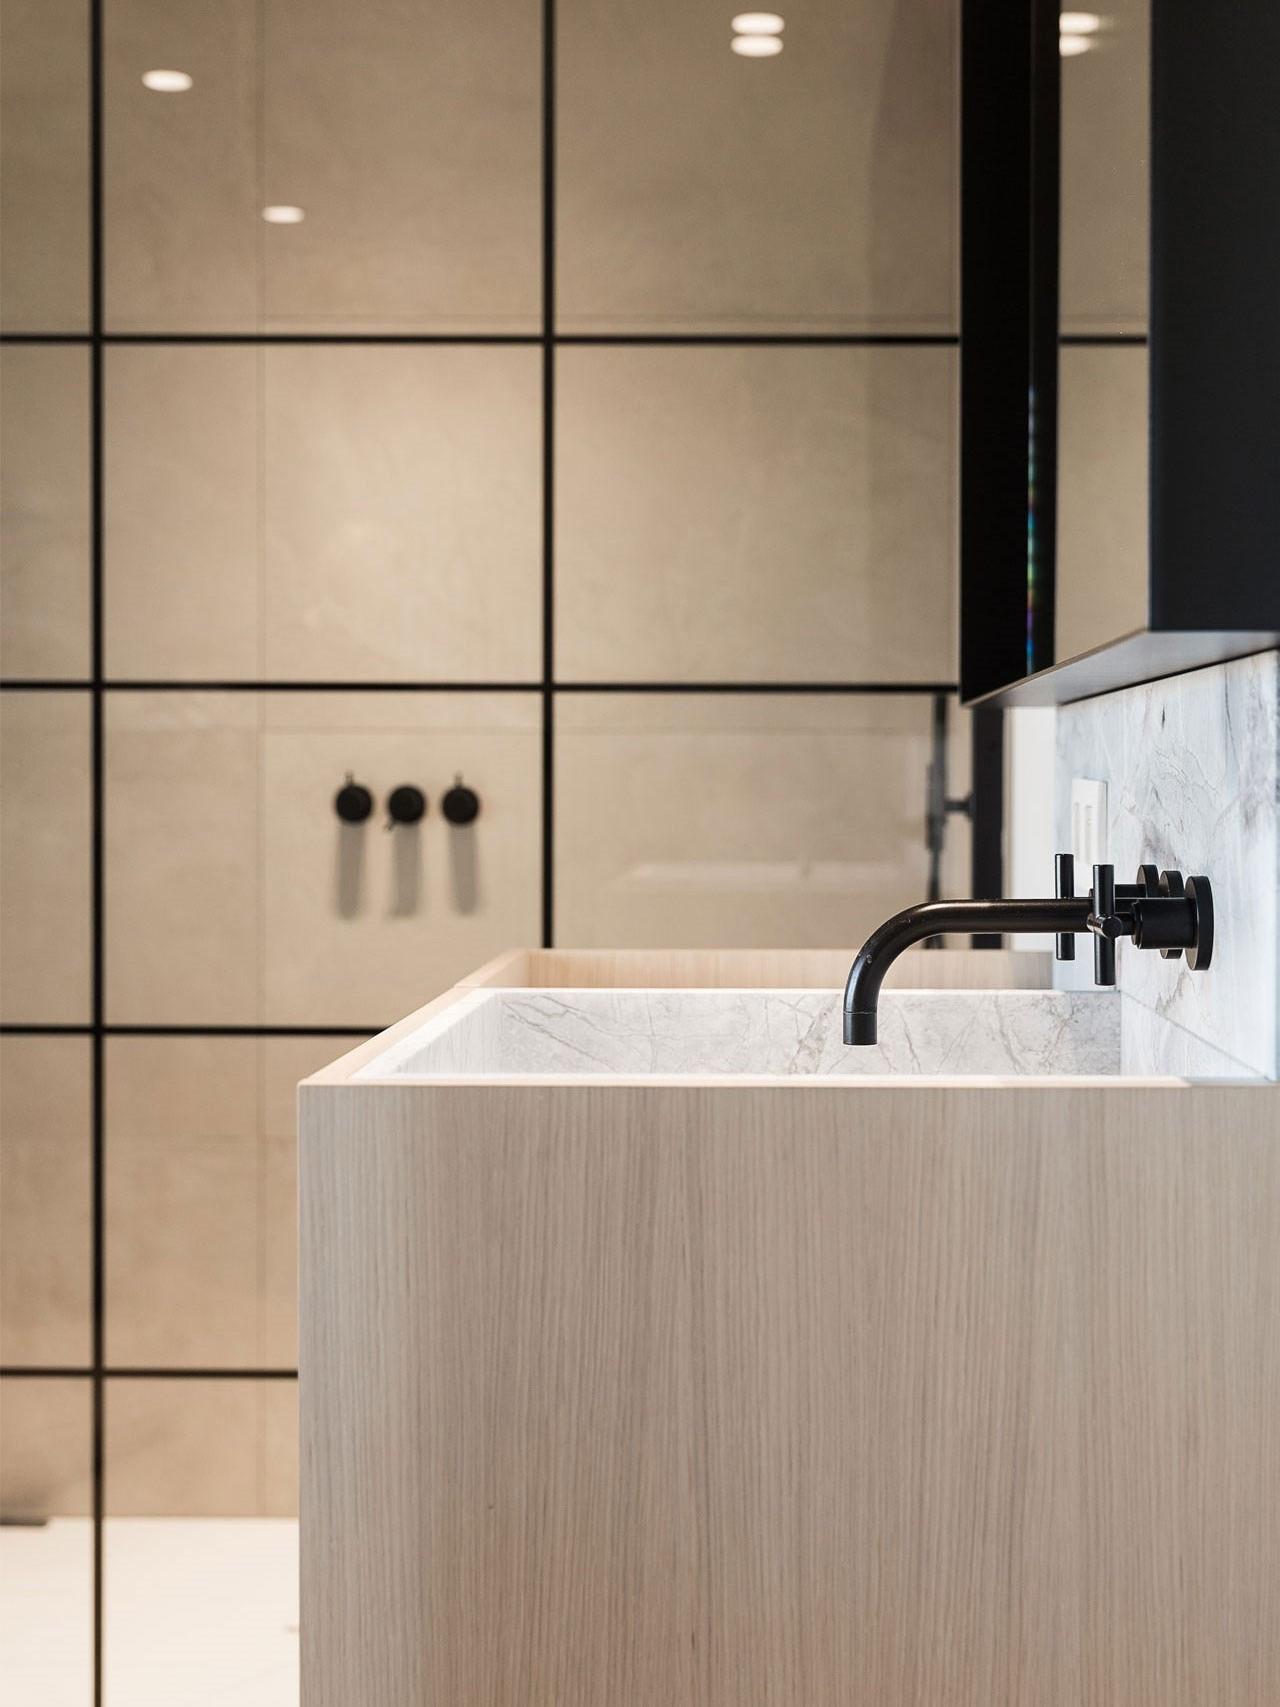 totaalinrichting-badkamer-haard-vestiaire-marmer-1.jpg